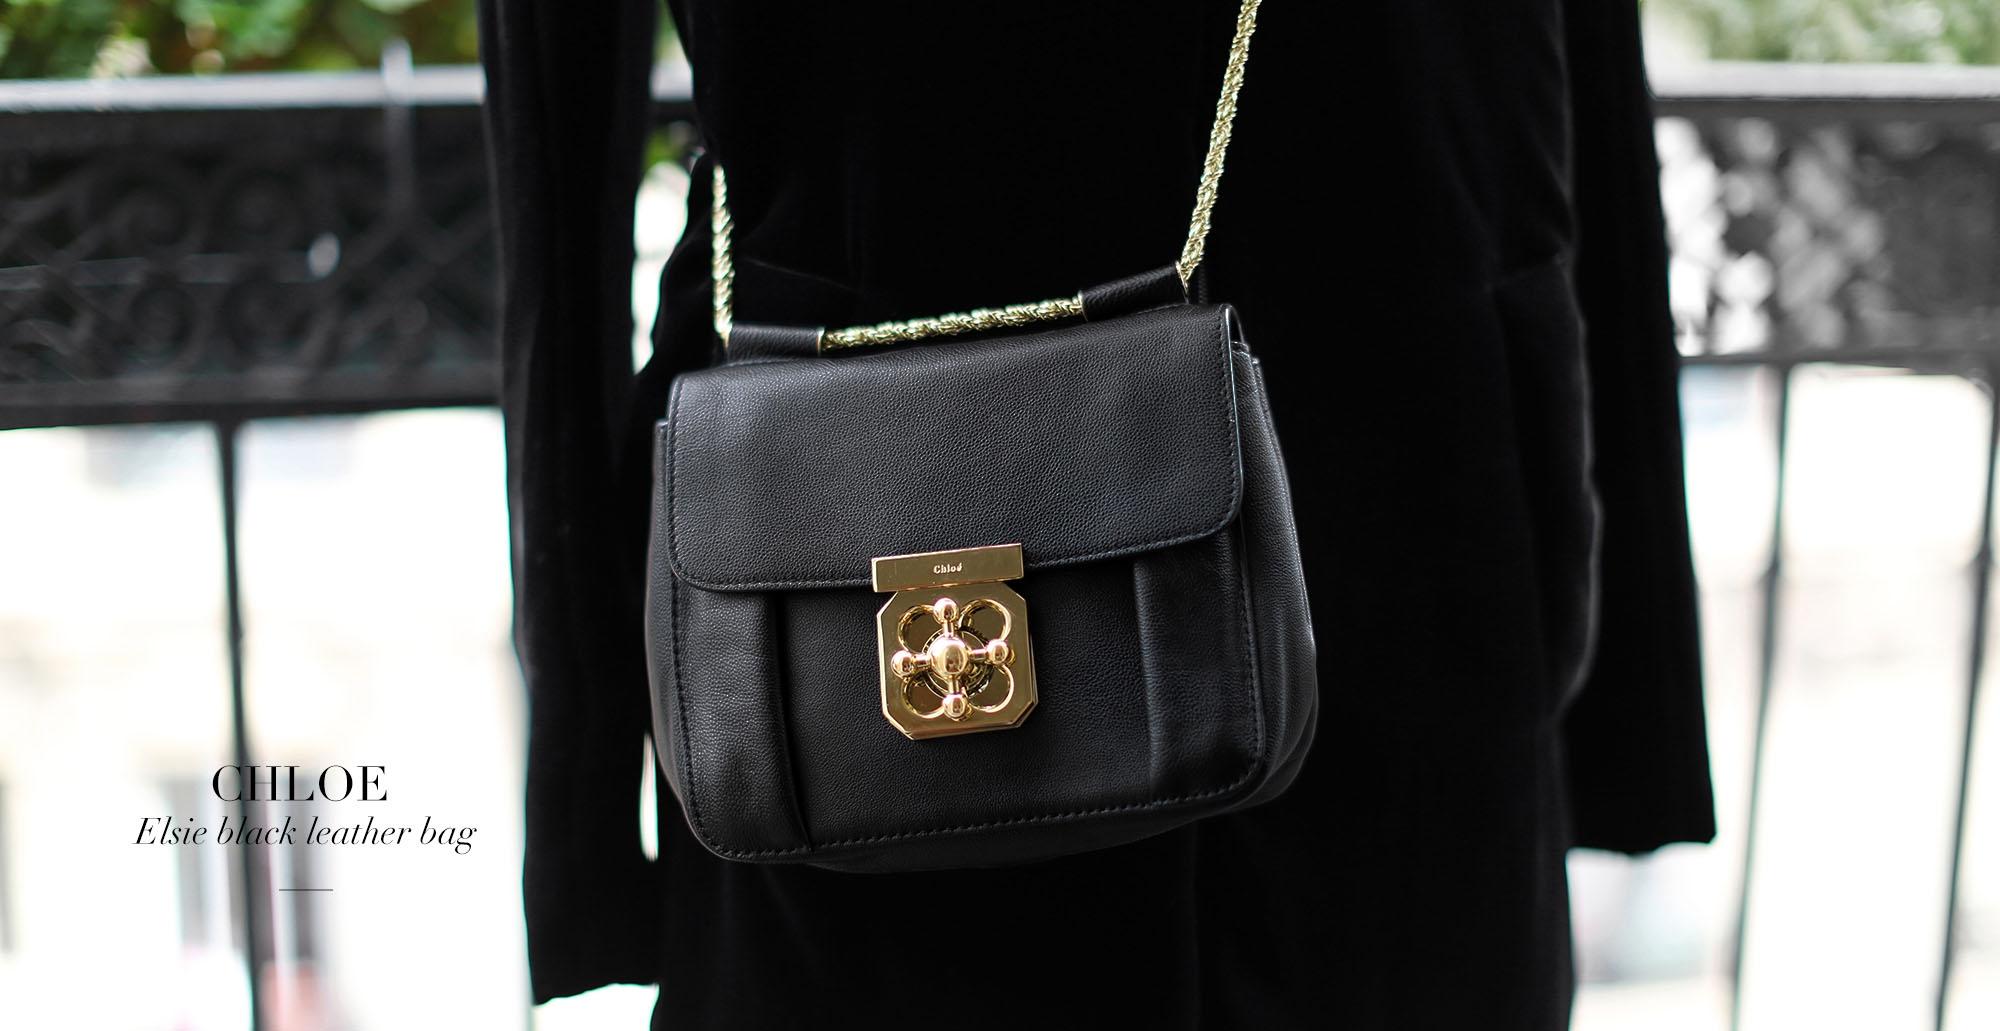 402d2514241 CHLOE Small black leather ELSIE cross body bag NEW Retail price 1110€